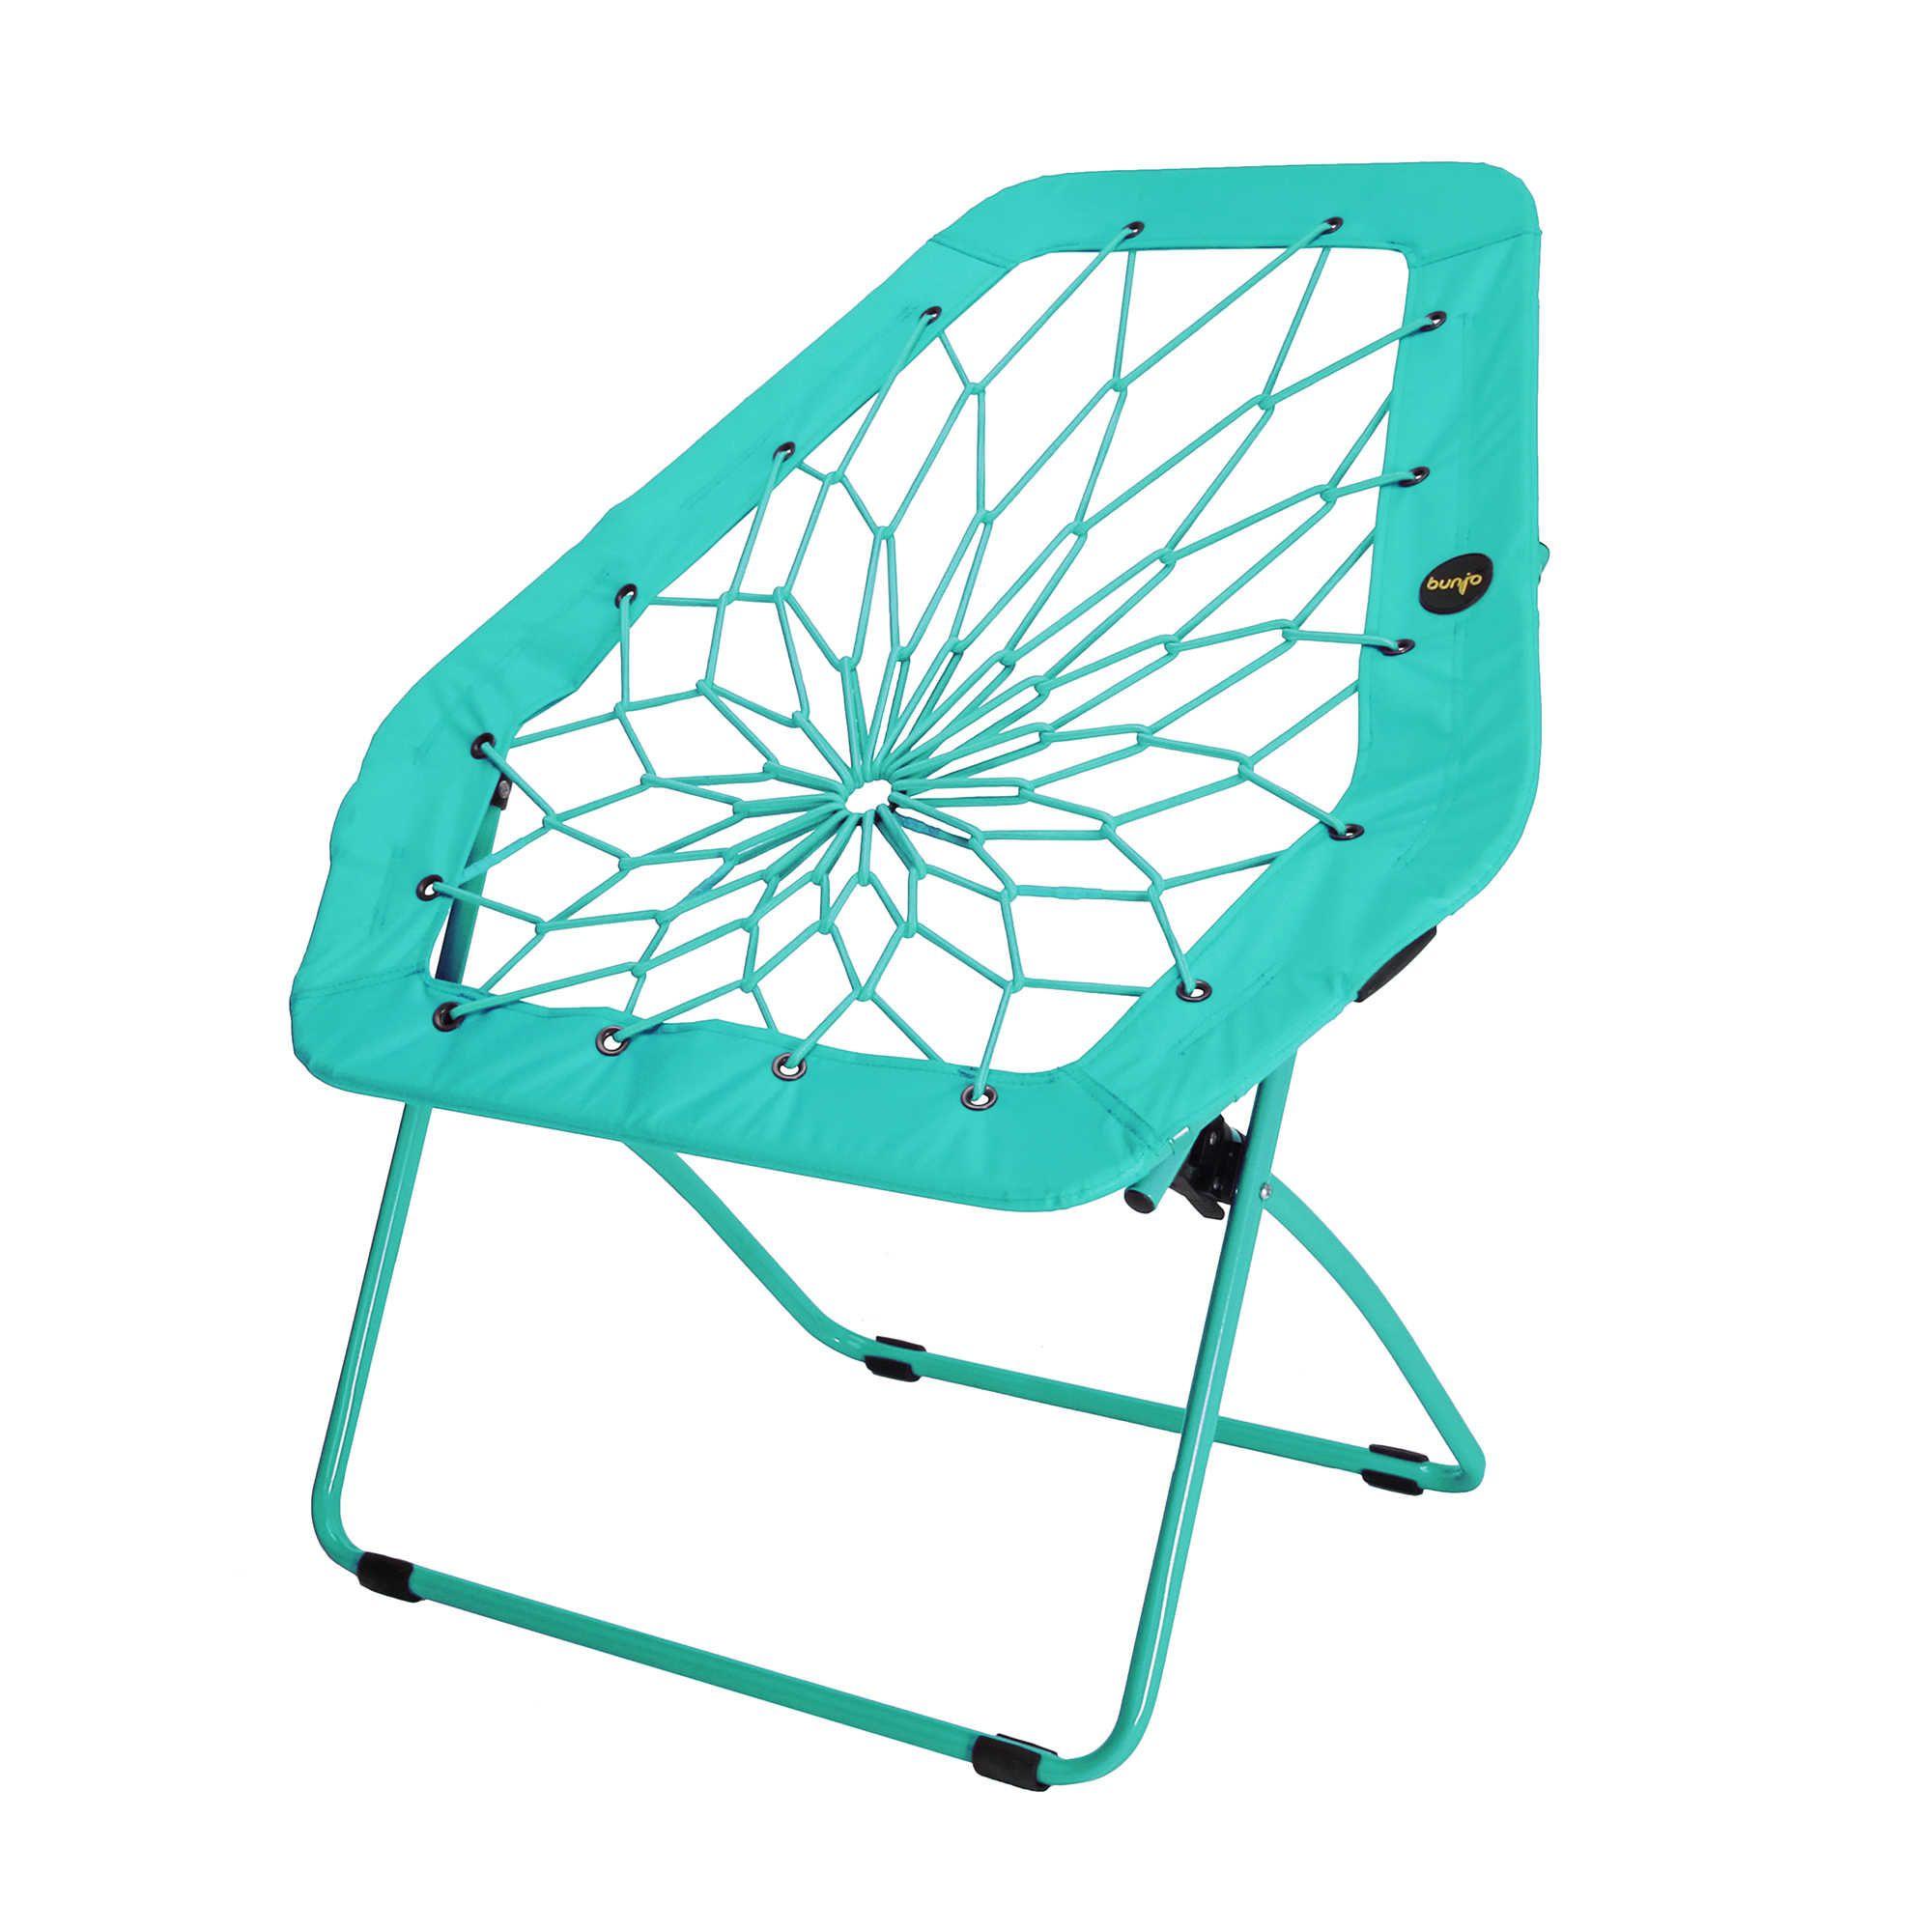 Bunjo Hex Bungee Chair Bungee Chair Chair Patio Chair